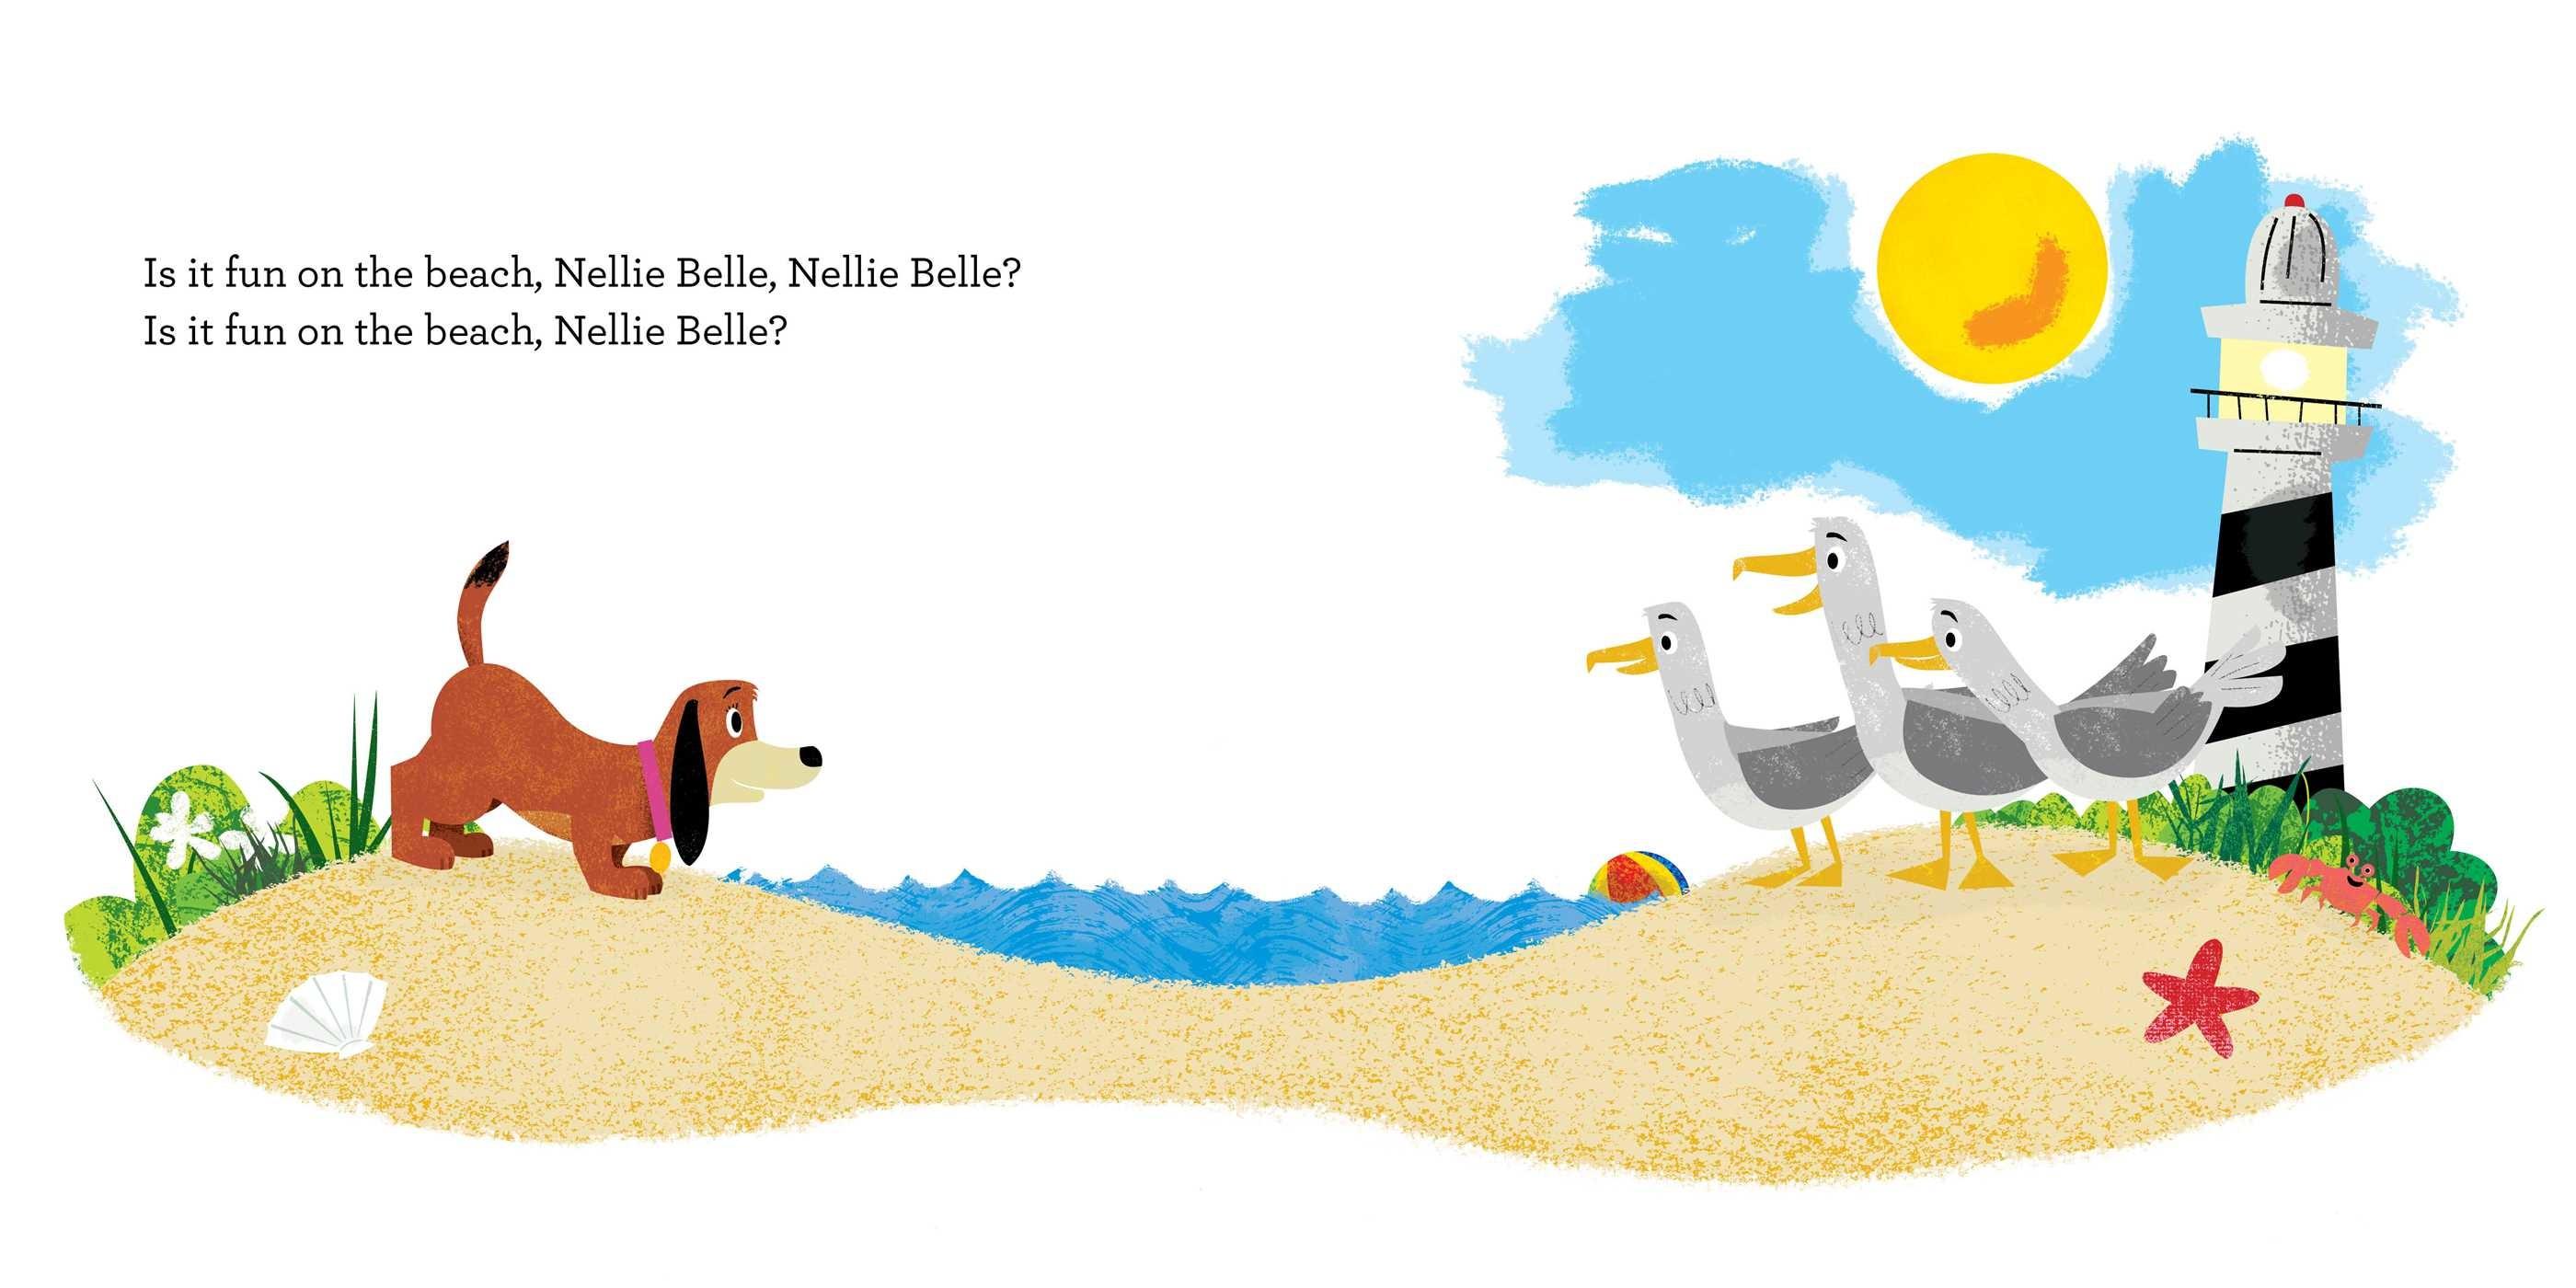 Nellie belle 9781416990055.in02